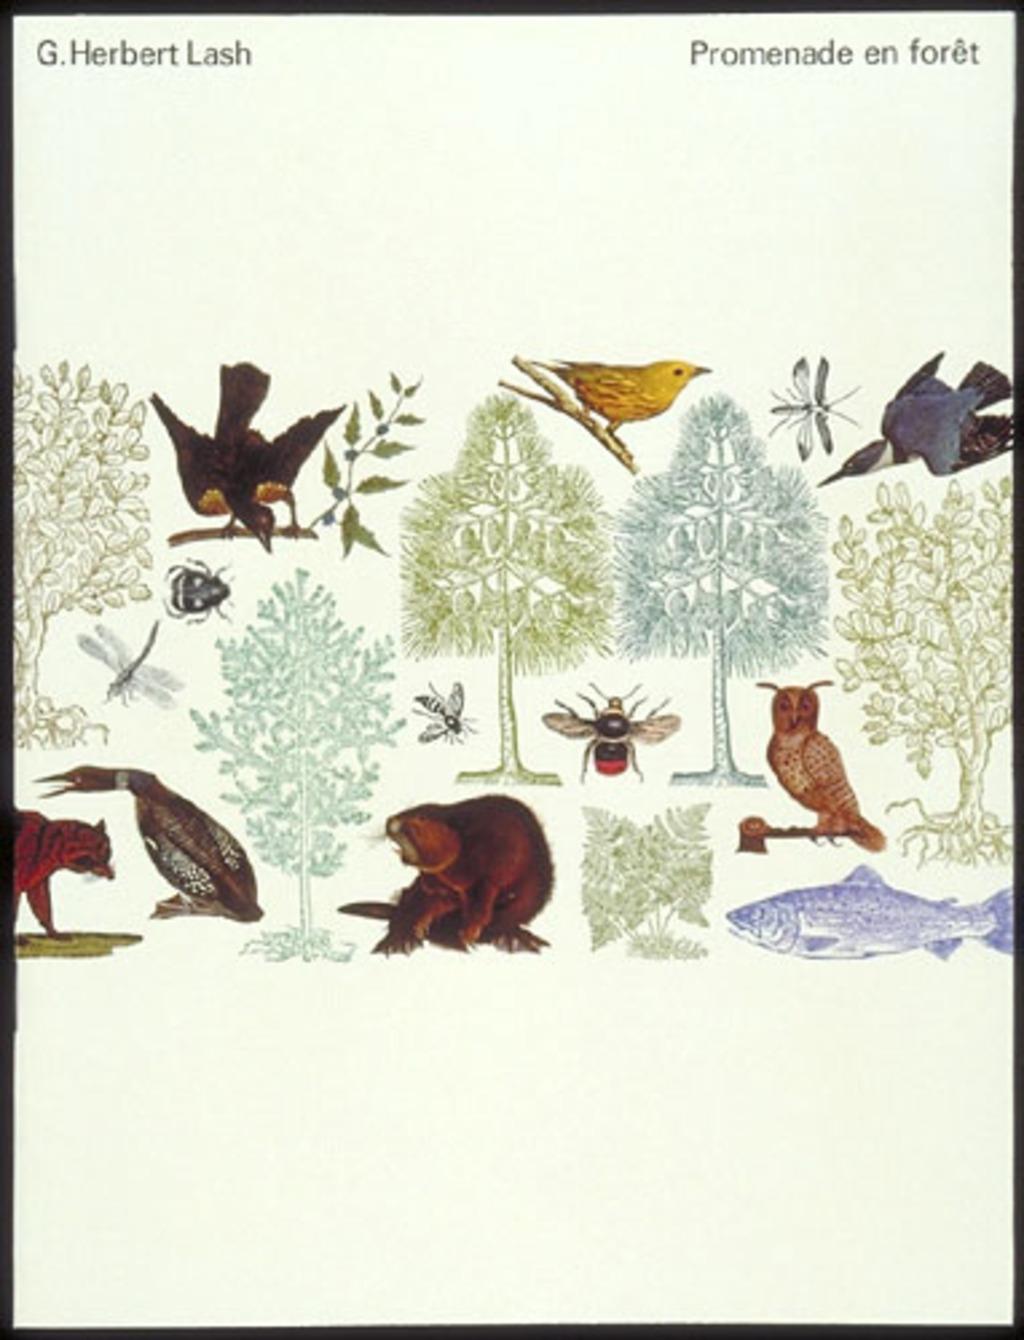 Brochure « G. Herbert Lash. Promenade en forêt »